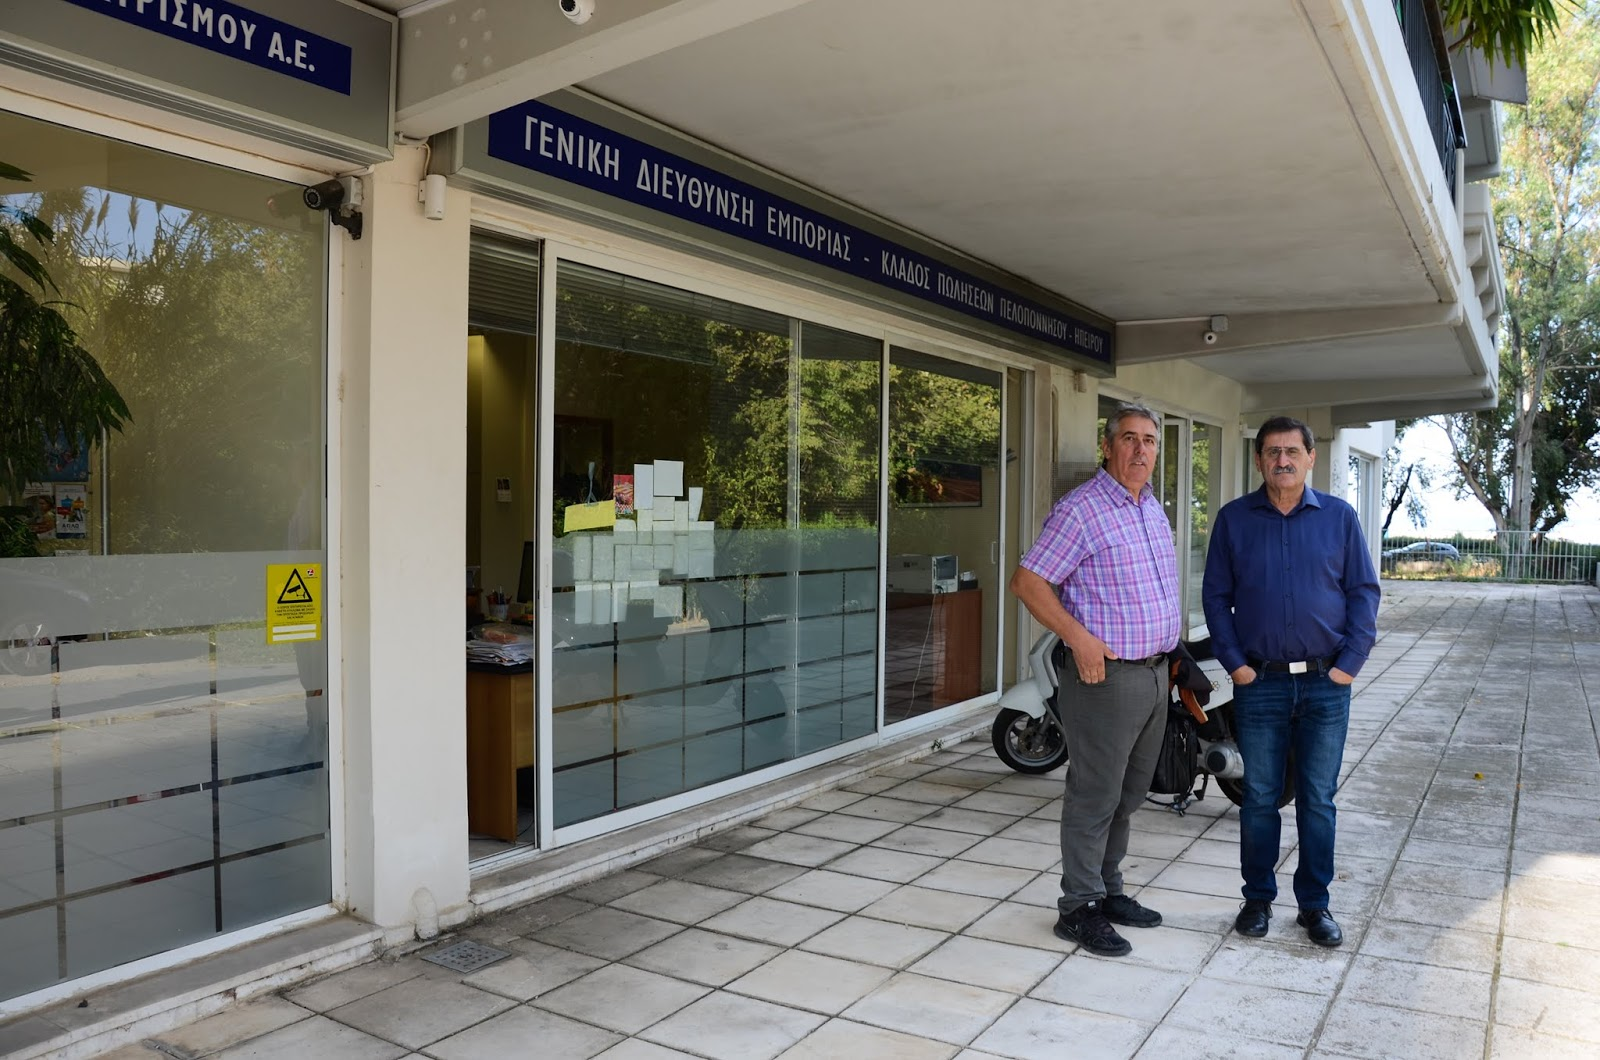 8ef4838f164 Ο Δήμαρχος Πατρέων Κώστας Πελετίδης και ο Αντιδήμαρχος Κοινωνικής Πολιτικής  Δημήτρης Πελεκούδας, που είναι και εκπρόσωπος του Δήμου στην Επιτροπή που  ...